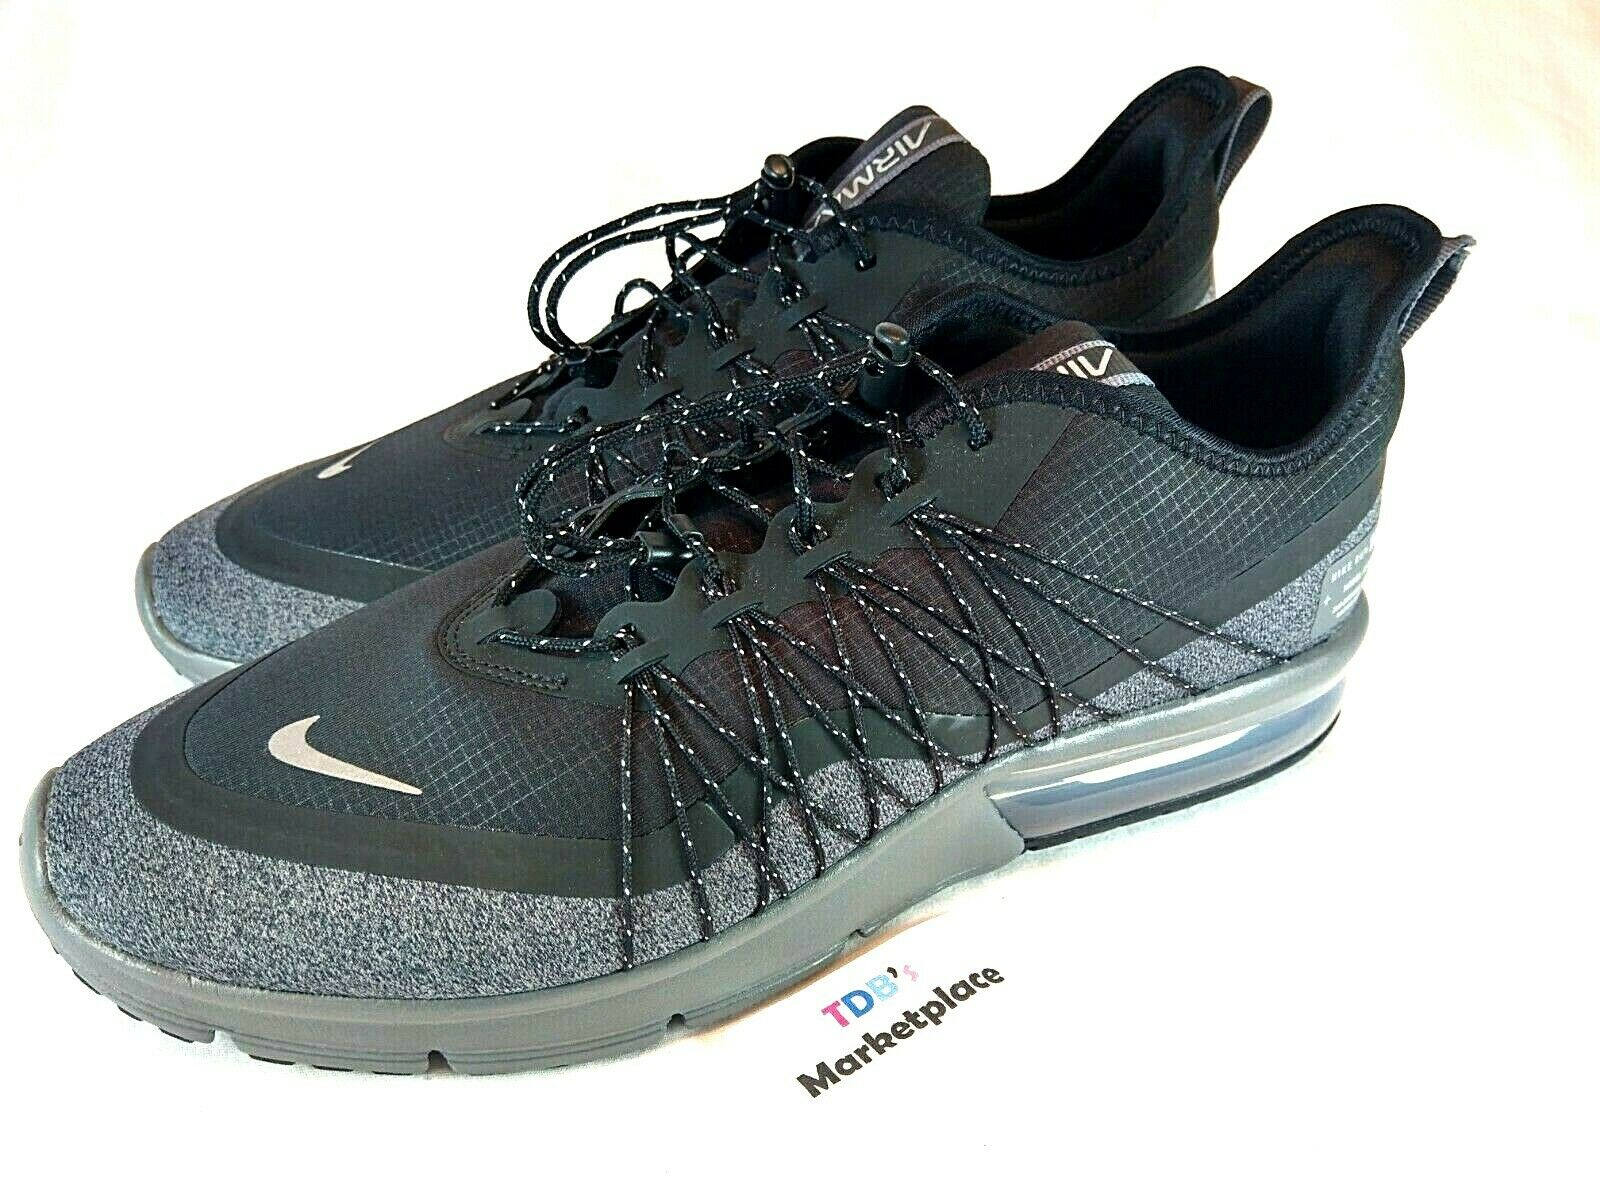 0292e4897d9e7 Nike Air Max Sequent 4 Shield Mens Av3236-001 Black Grey Utility ...